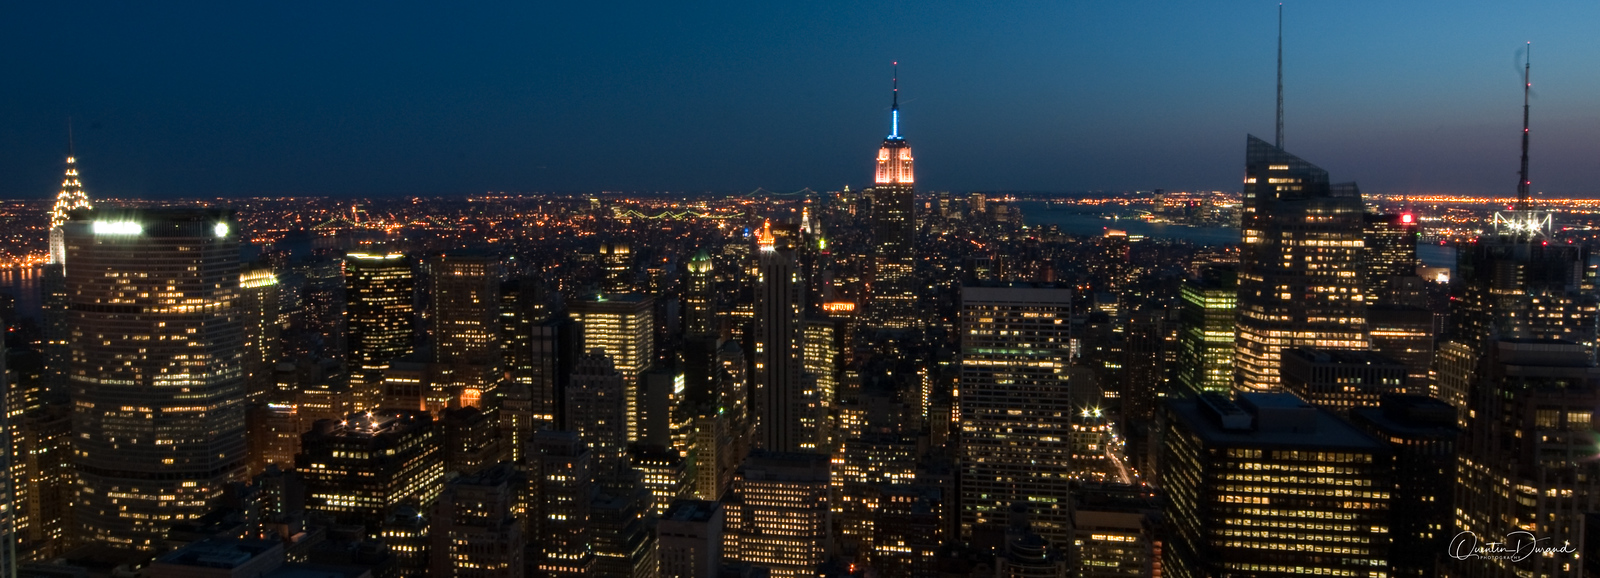 Manhattan by night - New York